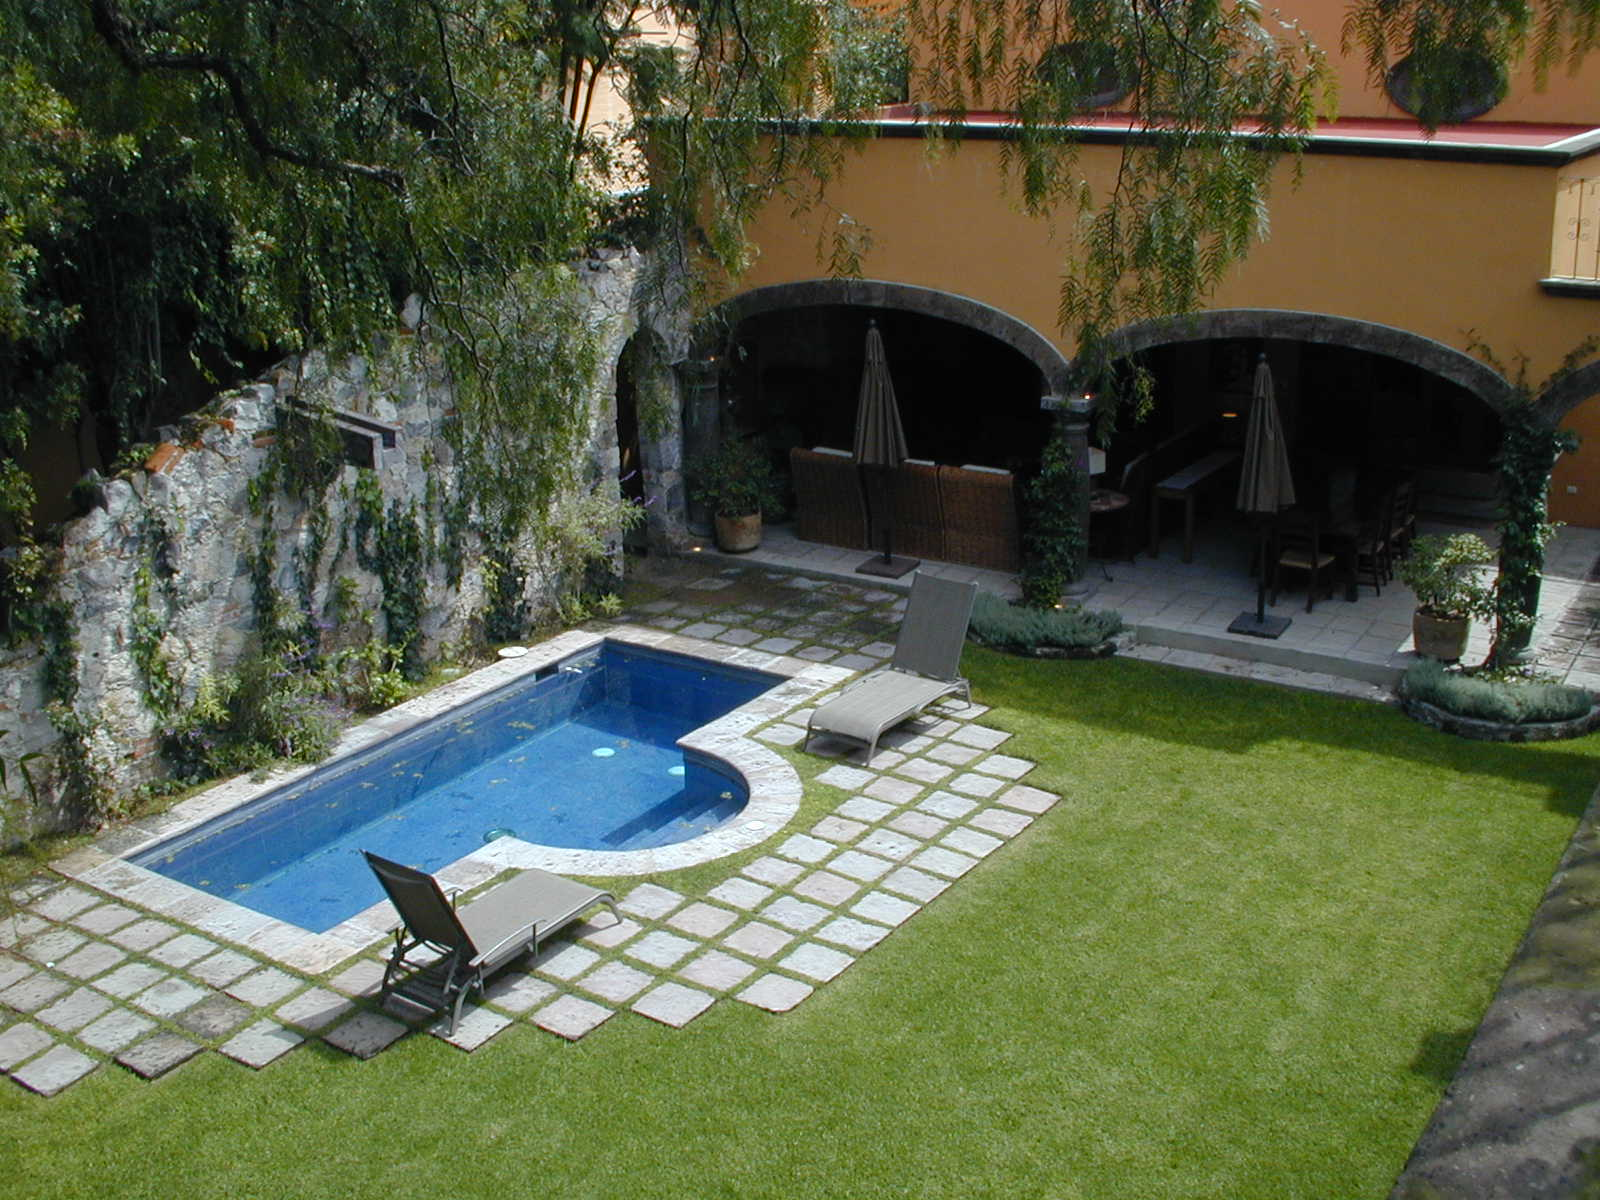 villaseñor_02 pool